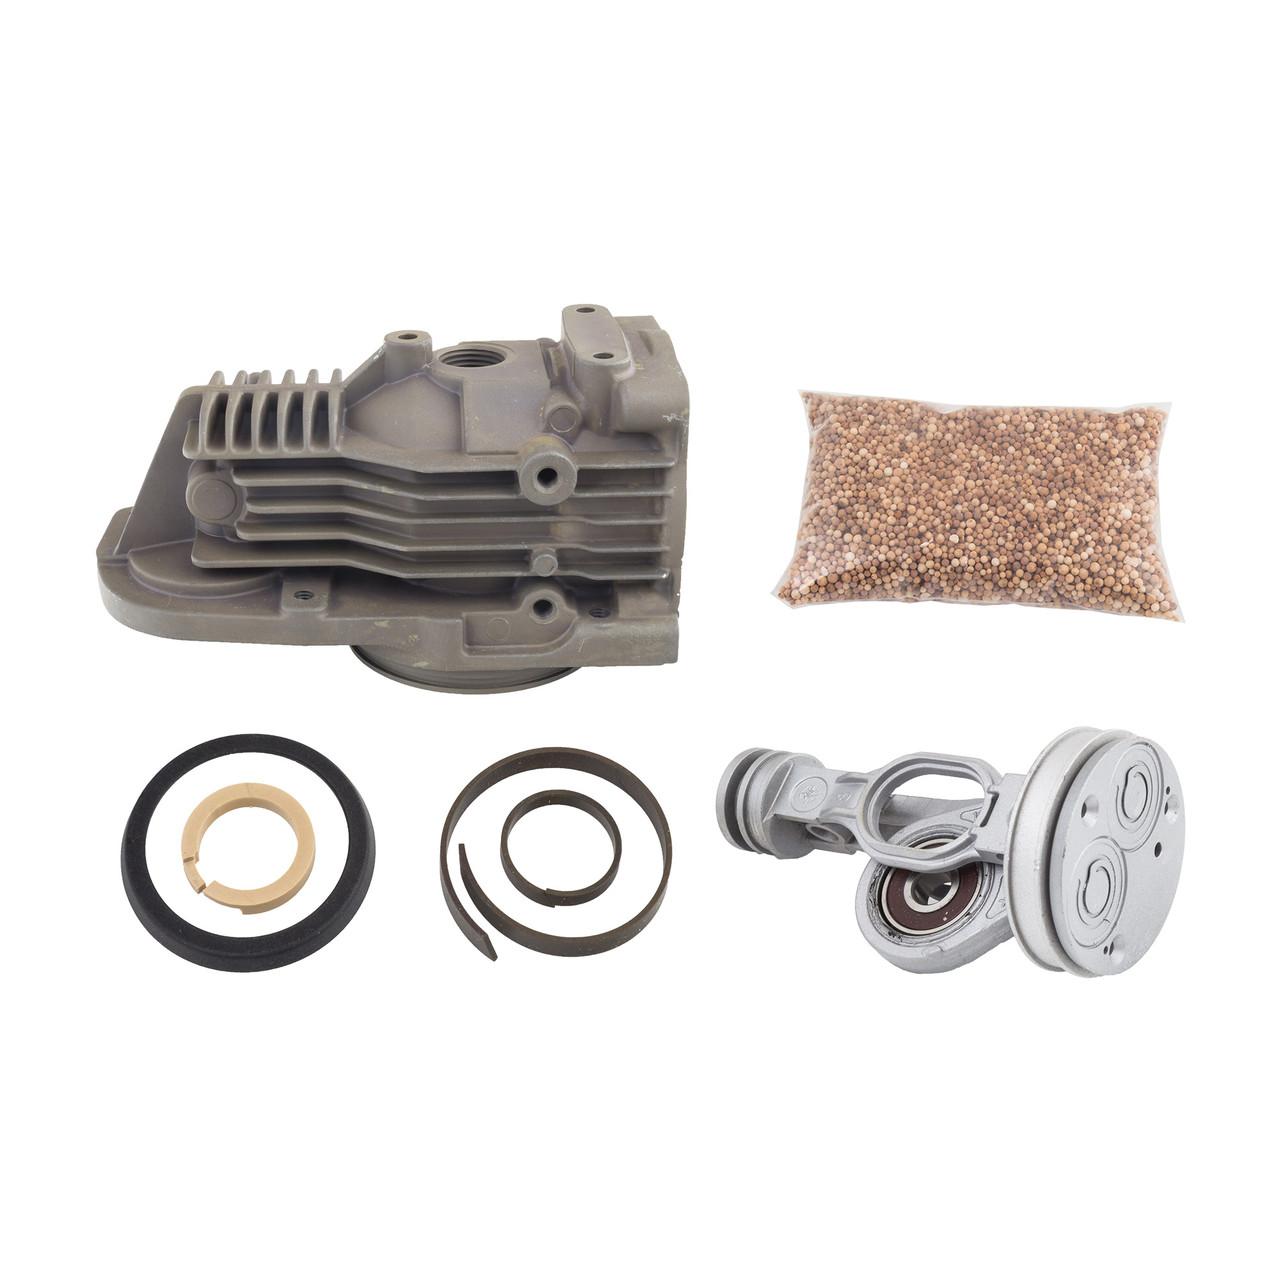 Ремкомплект компрессора пневмоподвески AMK (Mercedes W221 и W166)